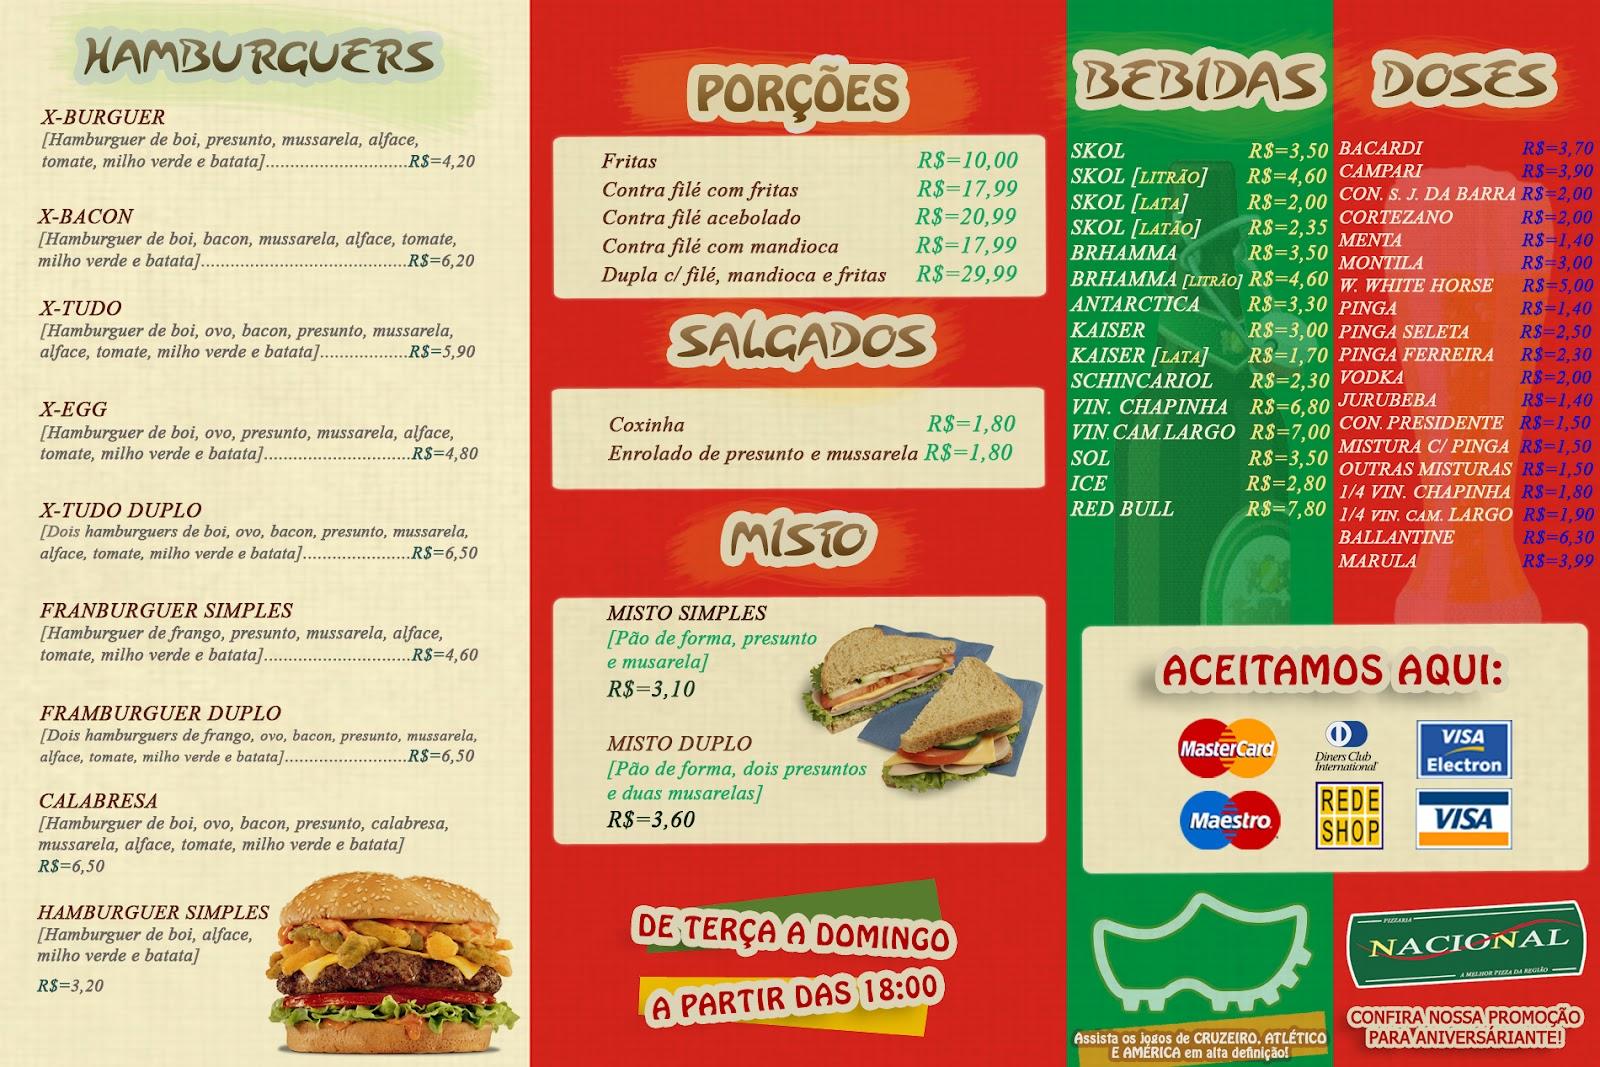 Cardápio Pizzaria Nacional - Frente   Leandroibtm